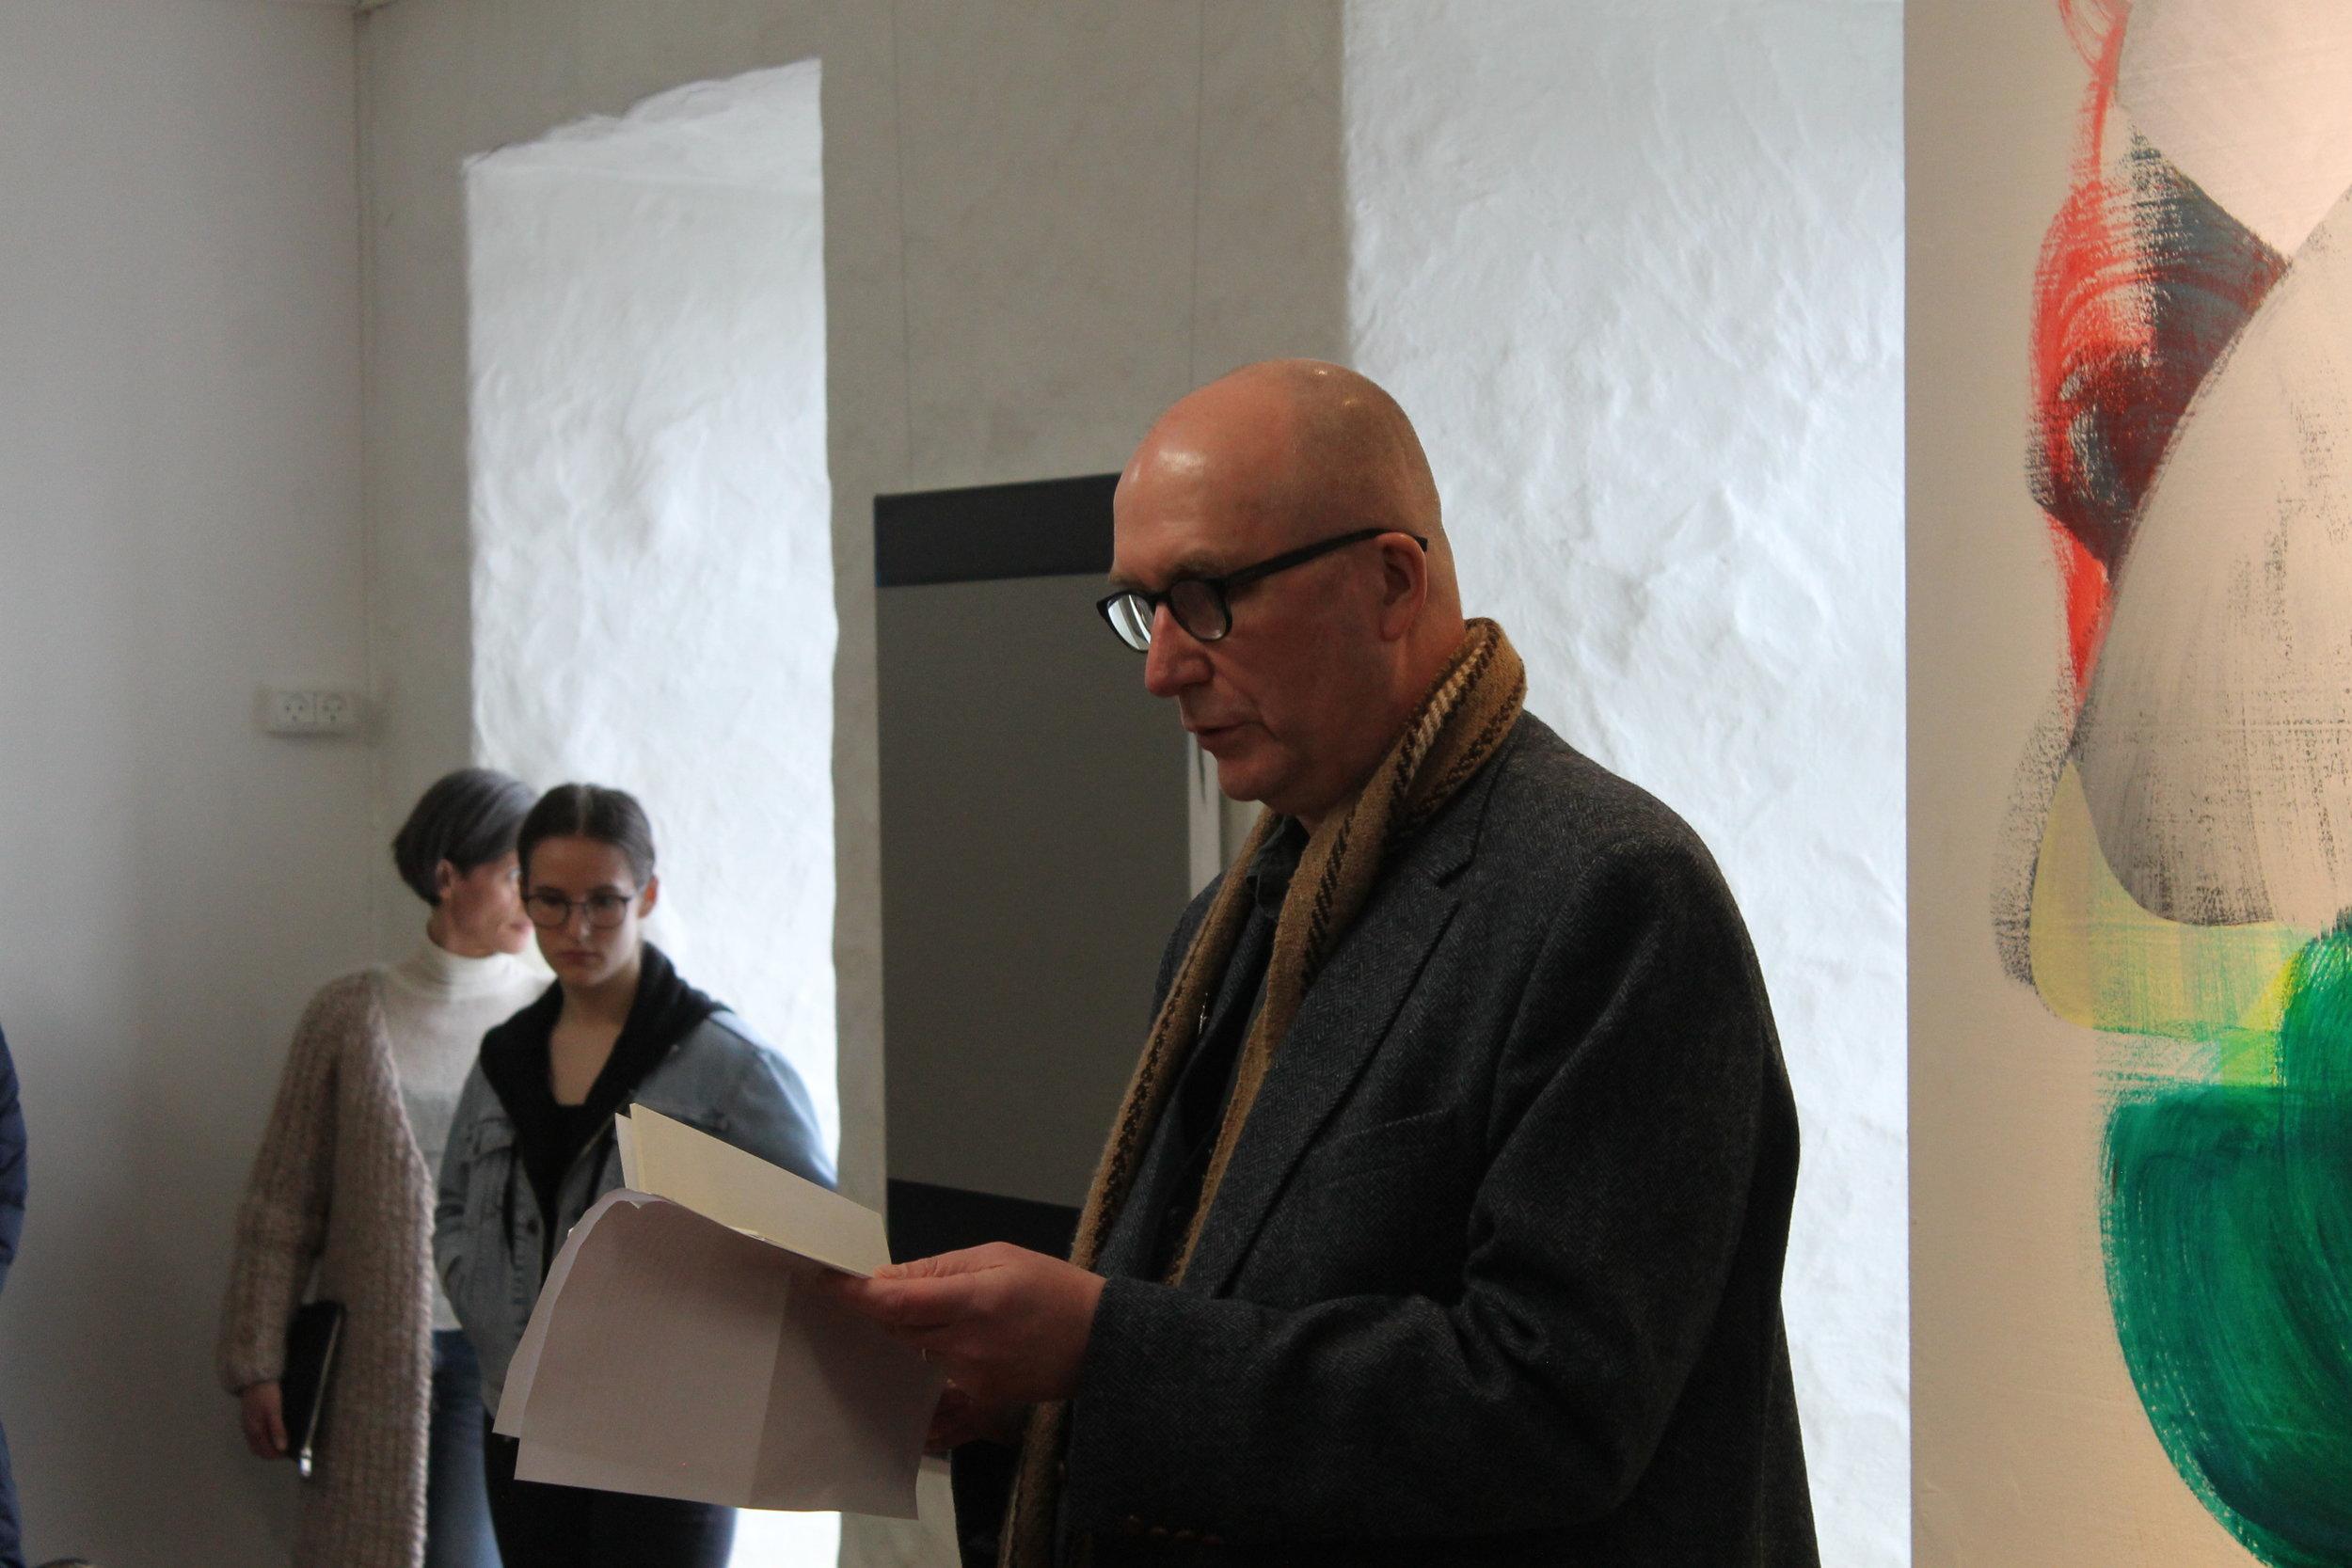 Carl Jóhan Jensen las upp